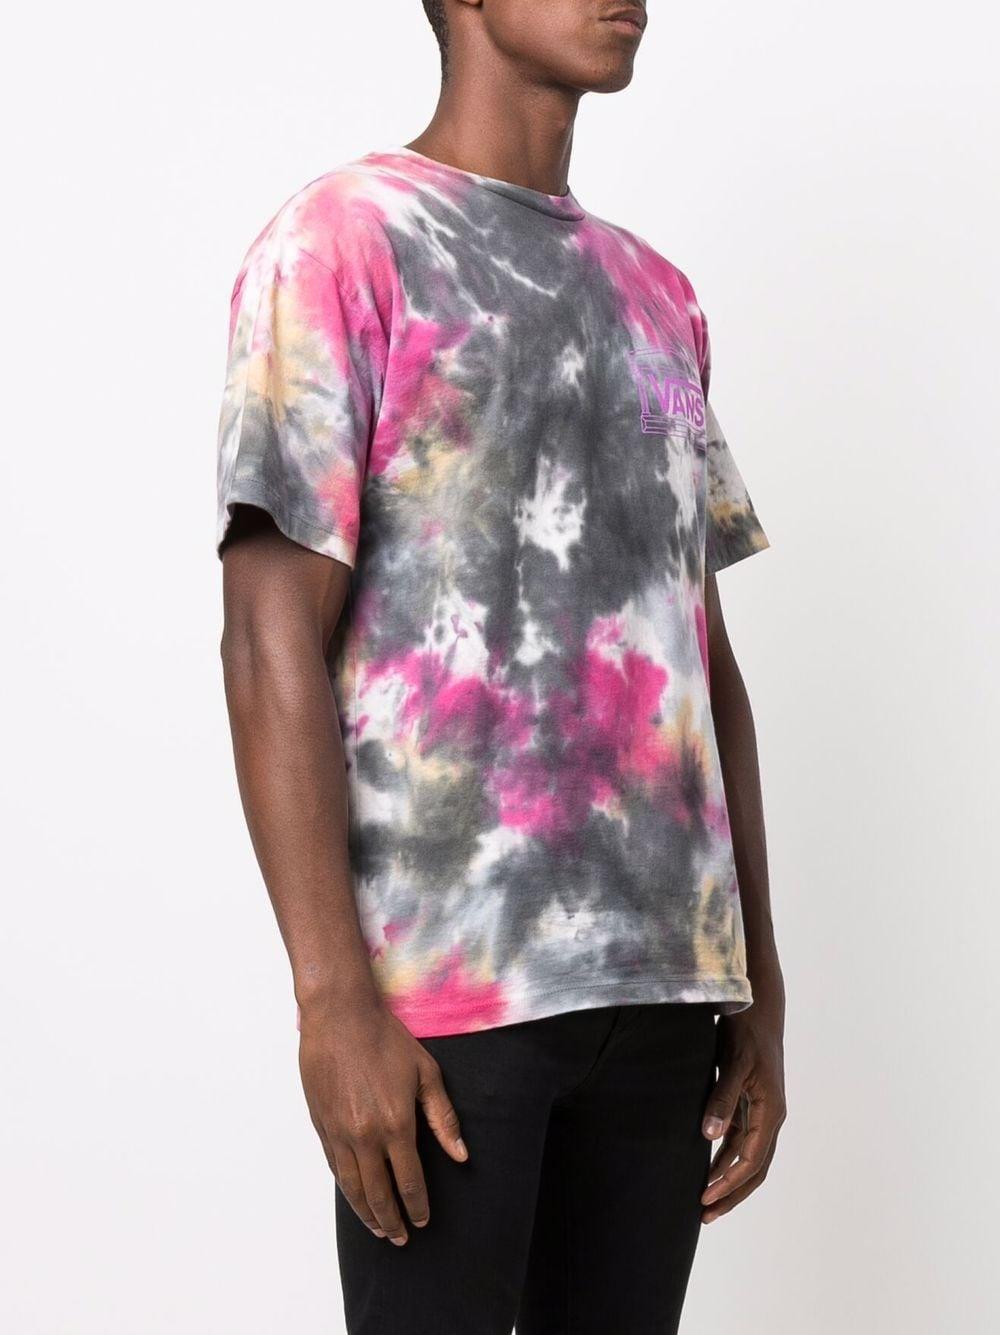 tie dye t-shirt man multicolor in cotton VANS VAULT X ARIES | T-shirts | VN0A5GYJYZC1